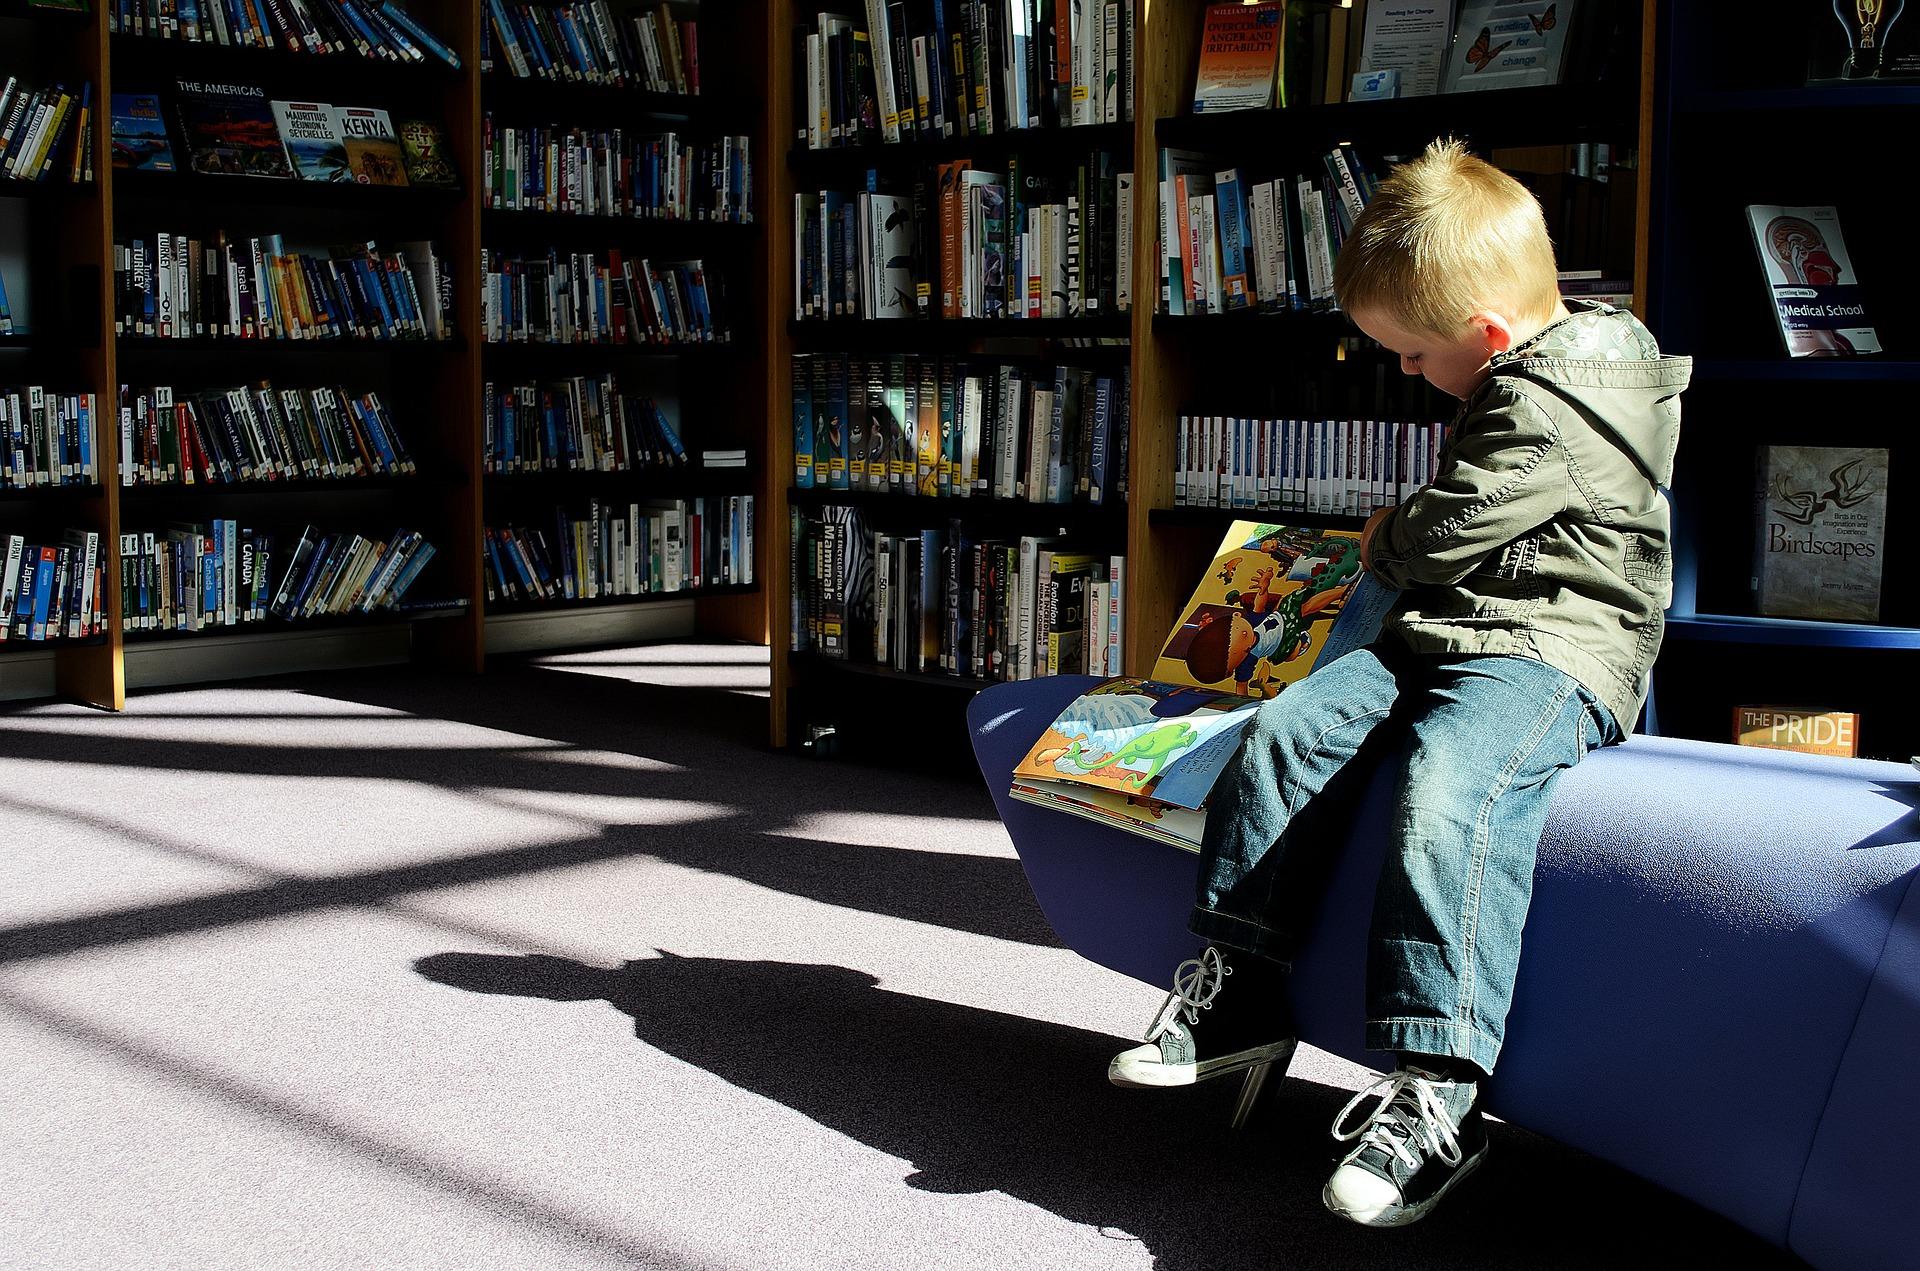 people, boy, reading